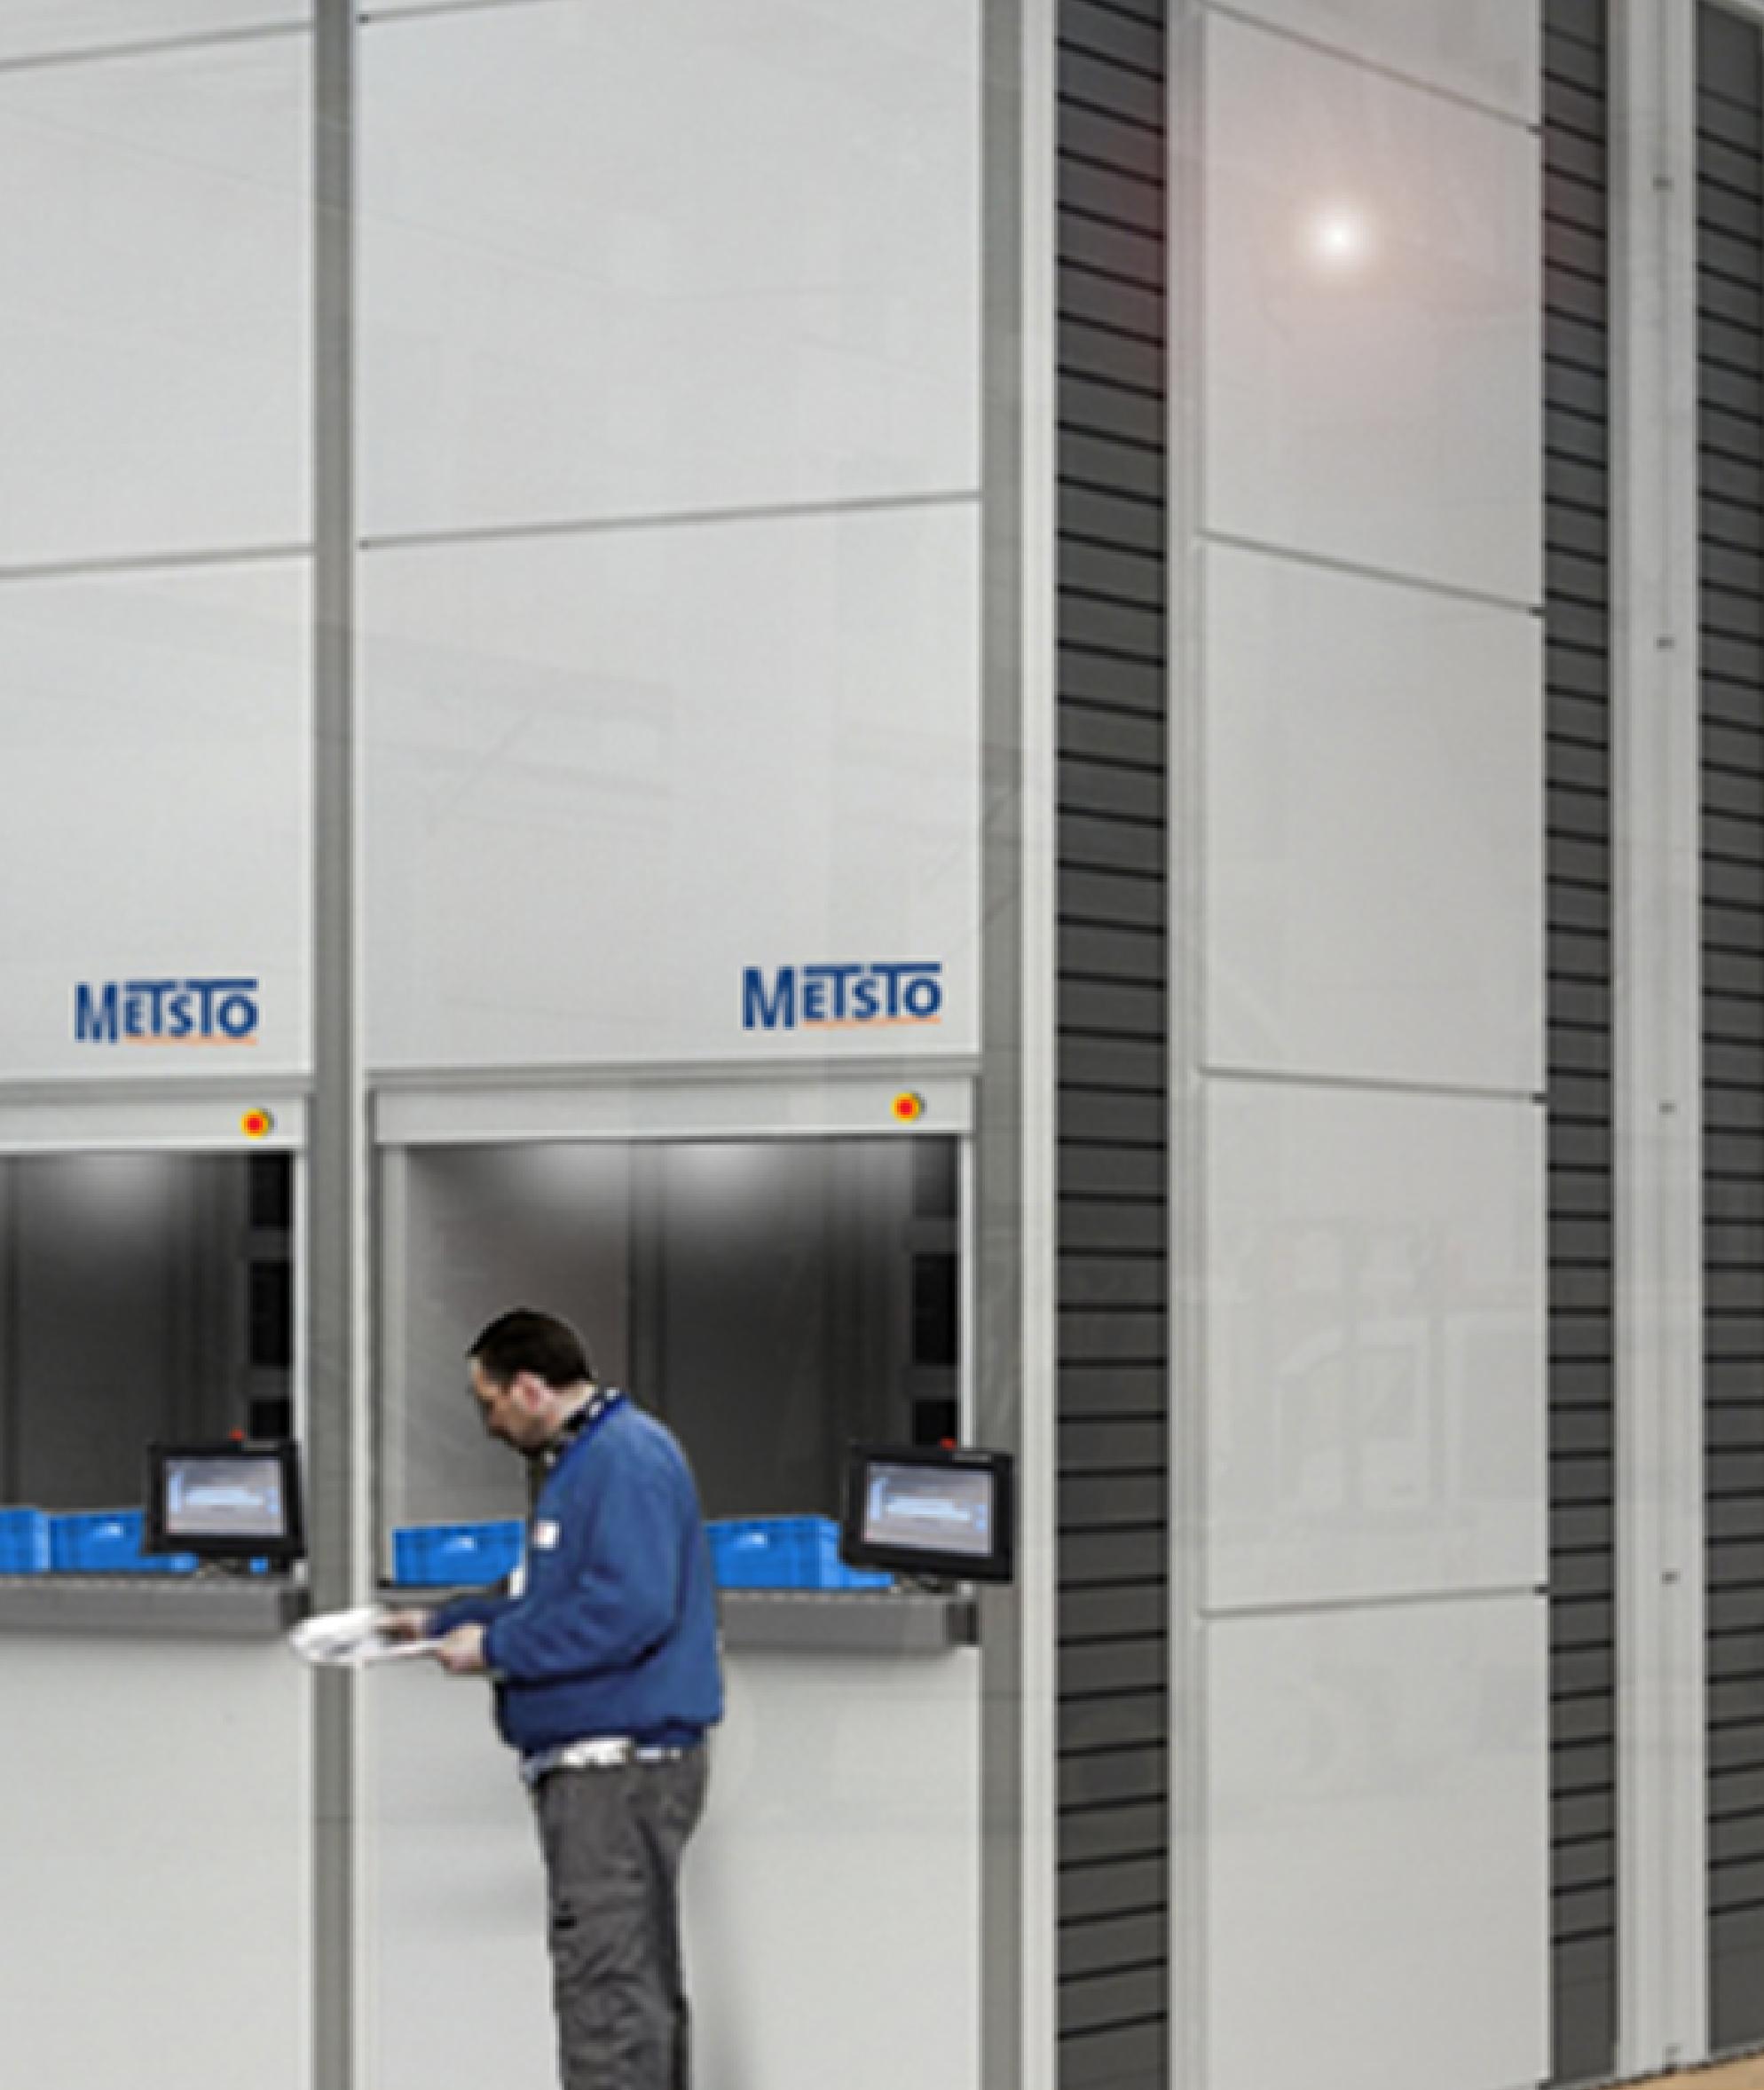 Metsto Systems